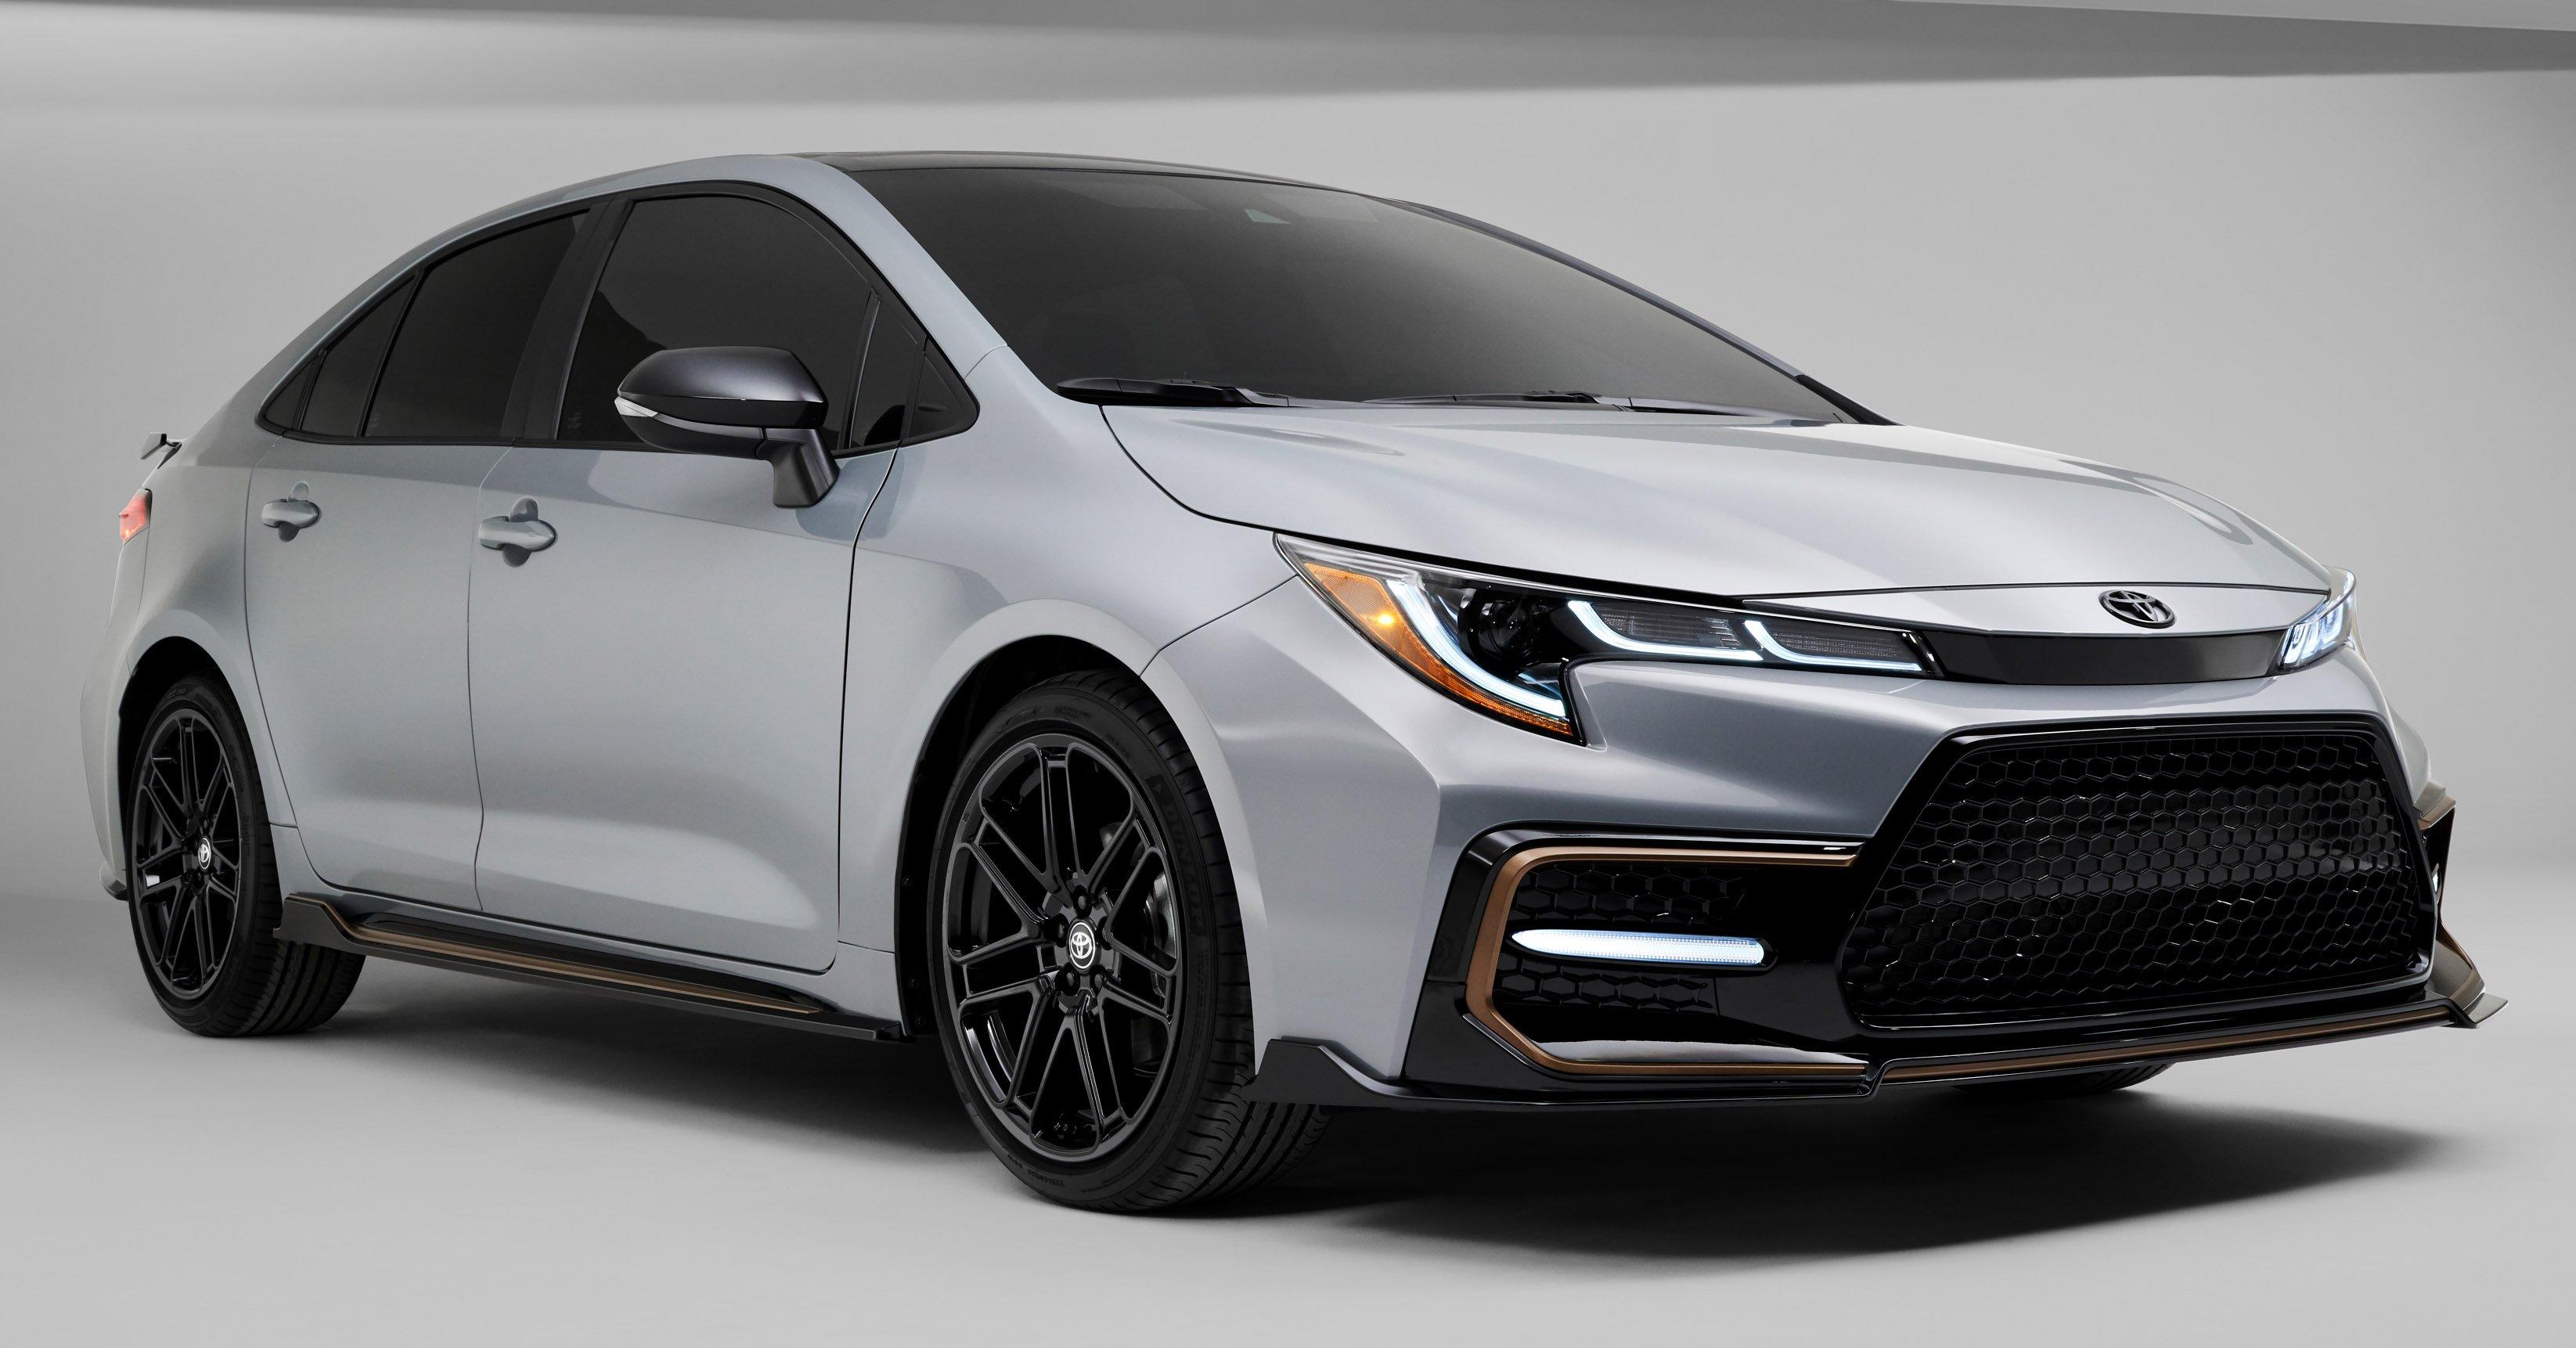 2021 Toyota Altis Configurations